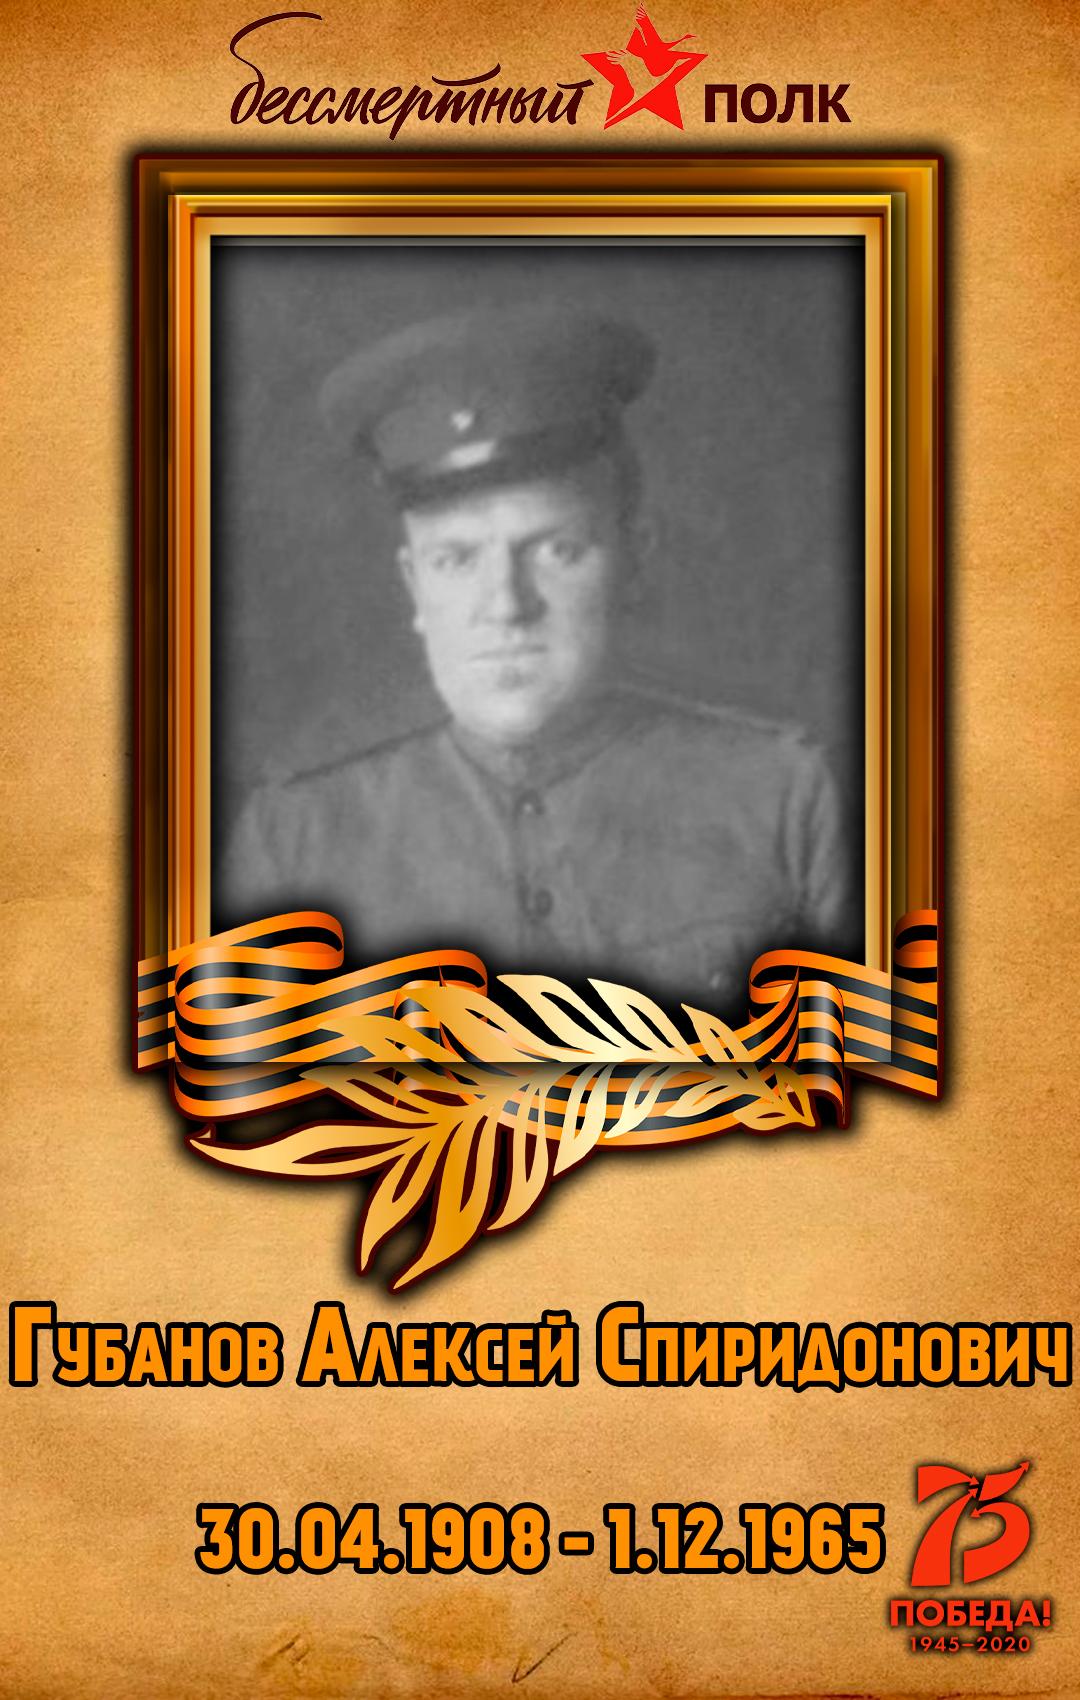 Губанов-Алексей-Спиридонович